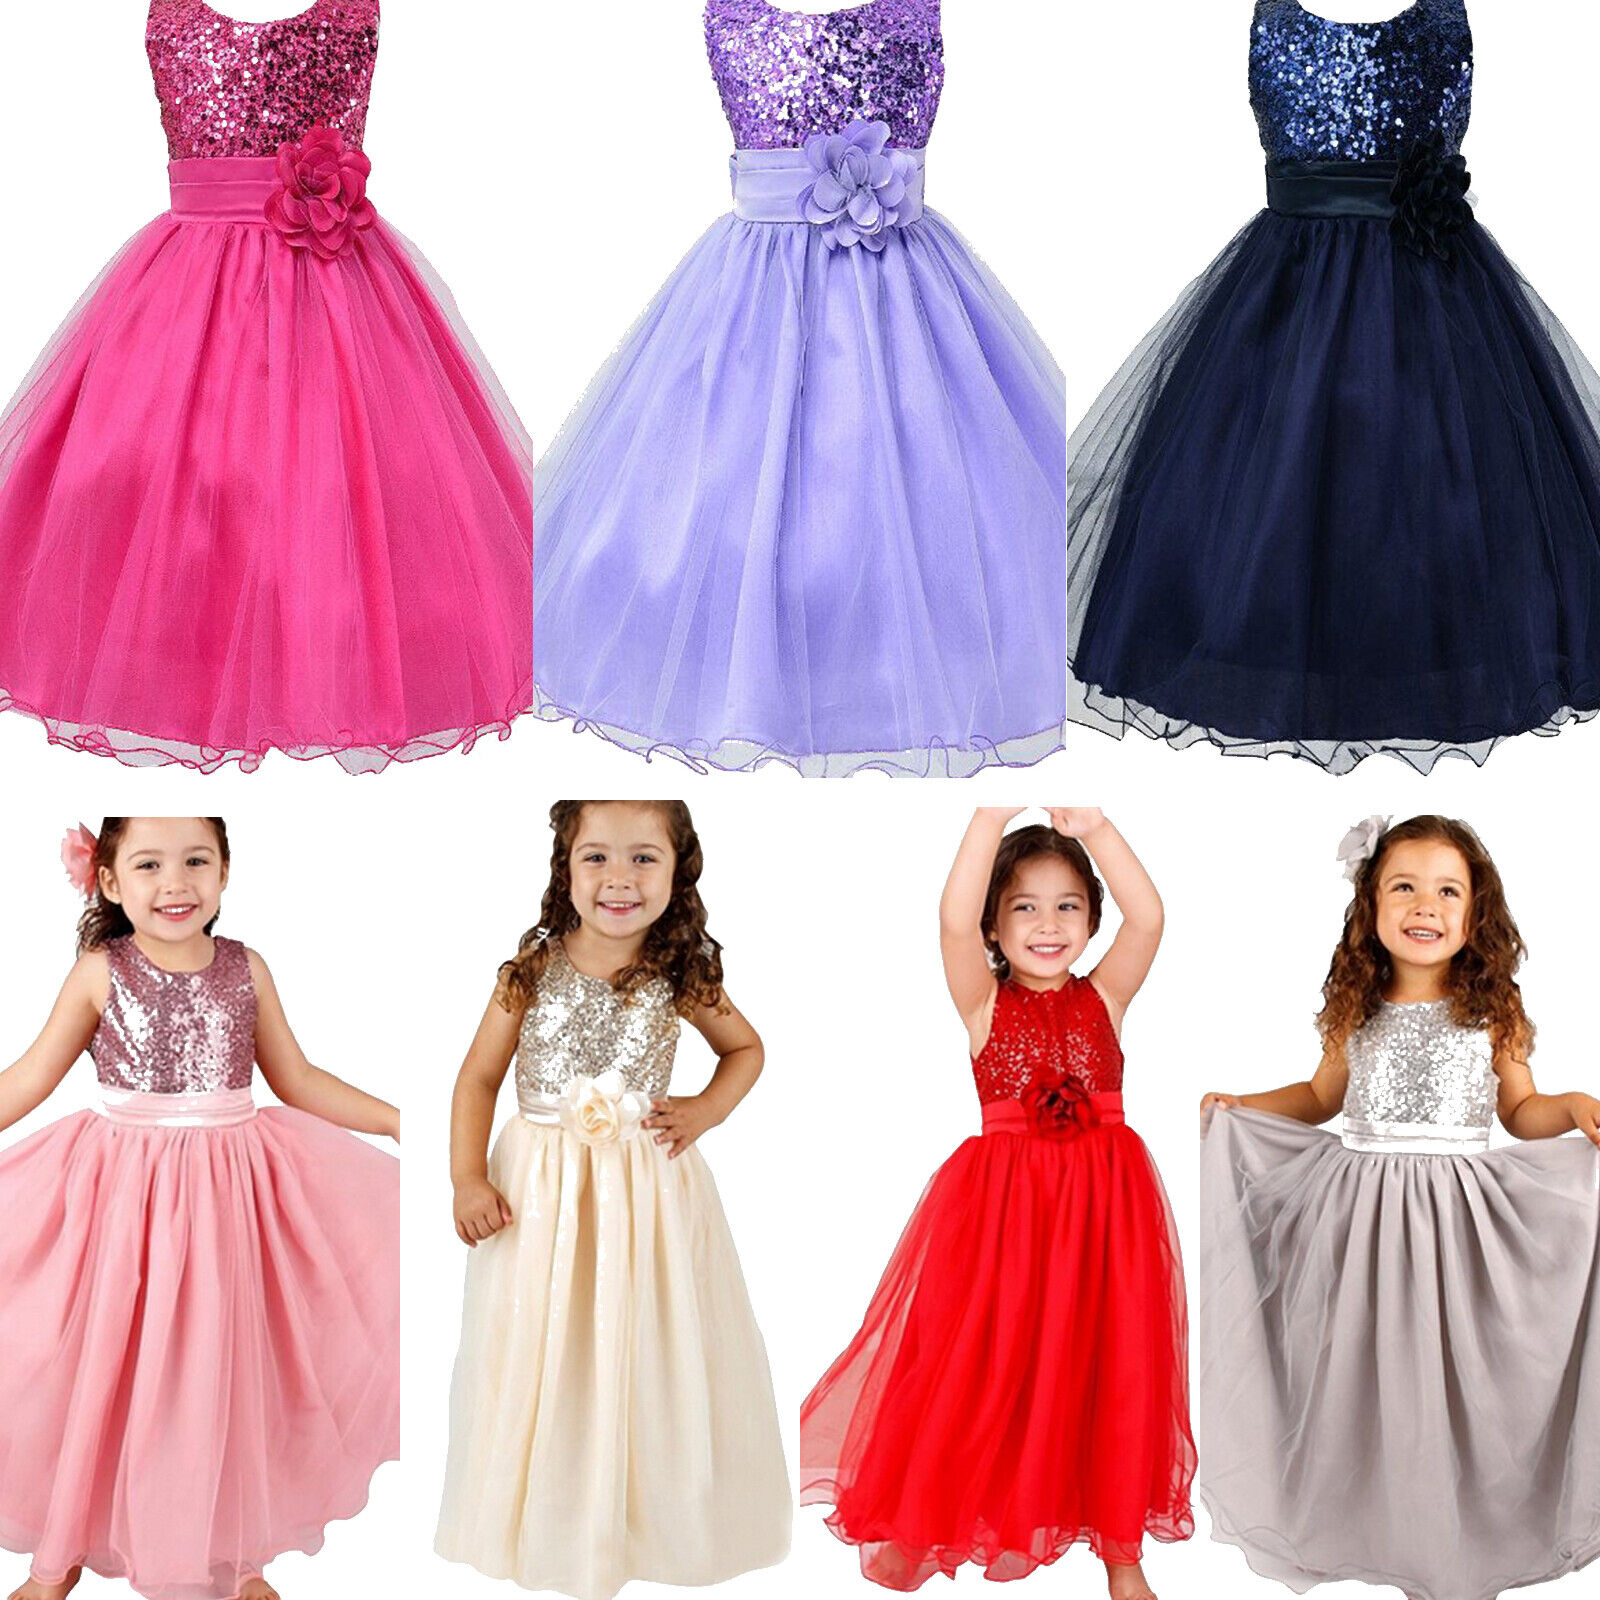 Kid Girl Party Sequins Wedding Formal Bridesmaid Princess Tank Dress Ball Gown